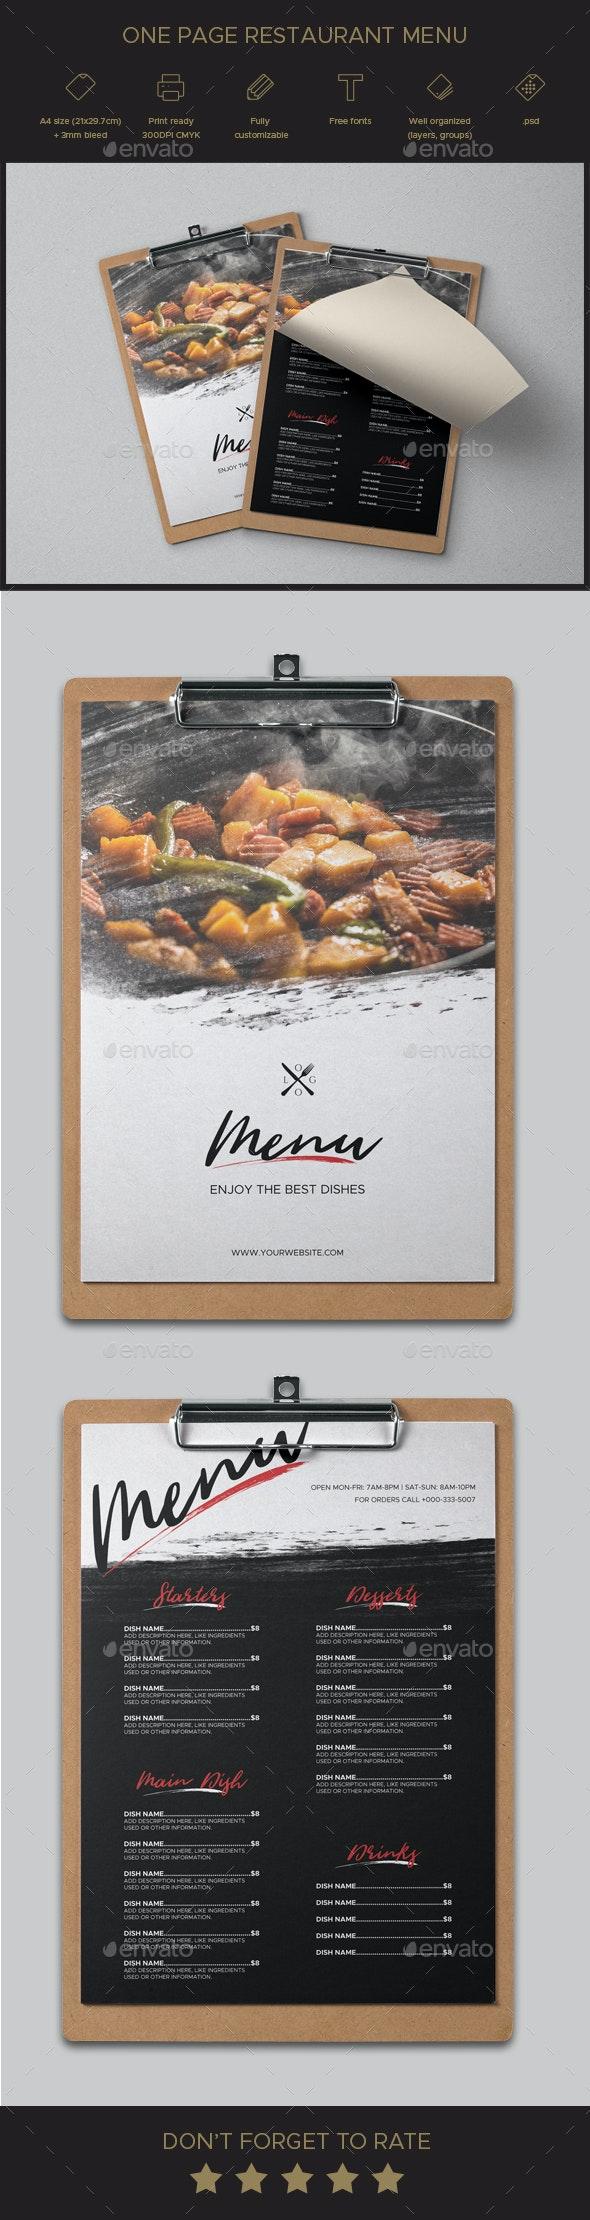 One Page Restaurant Menu - Food Menus Print Templates